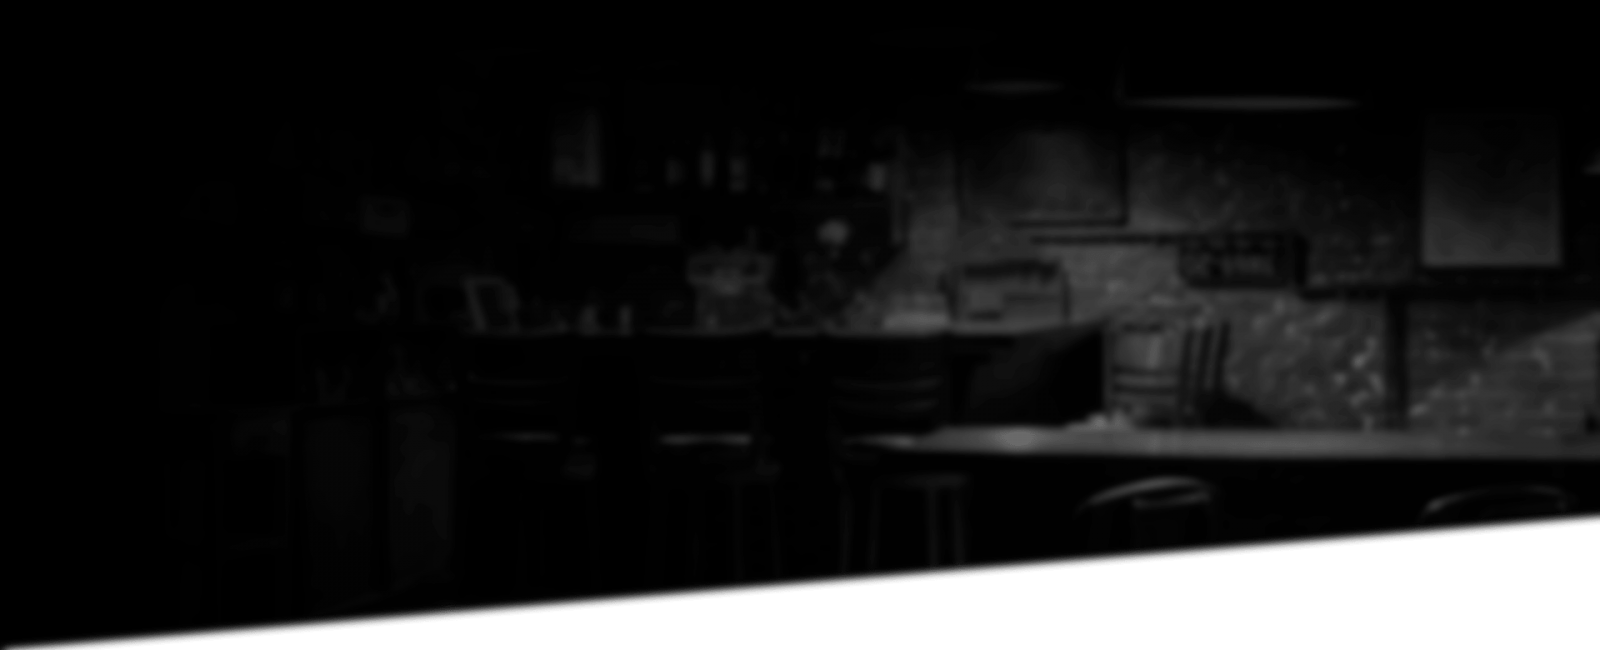 drink-slider-bg-3-blur-opt